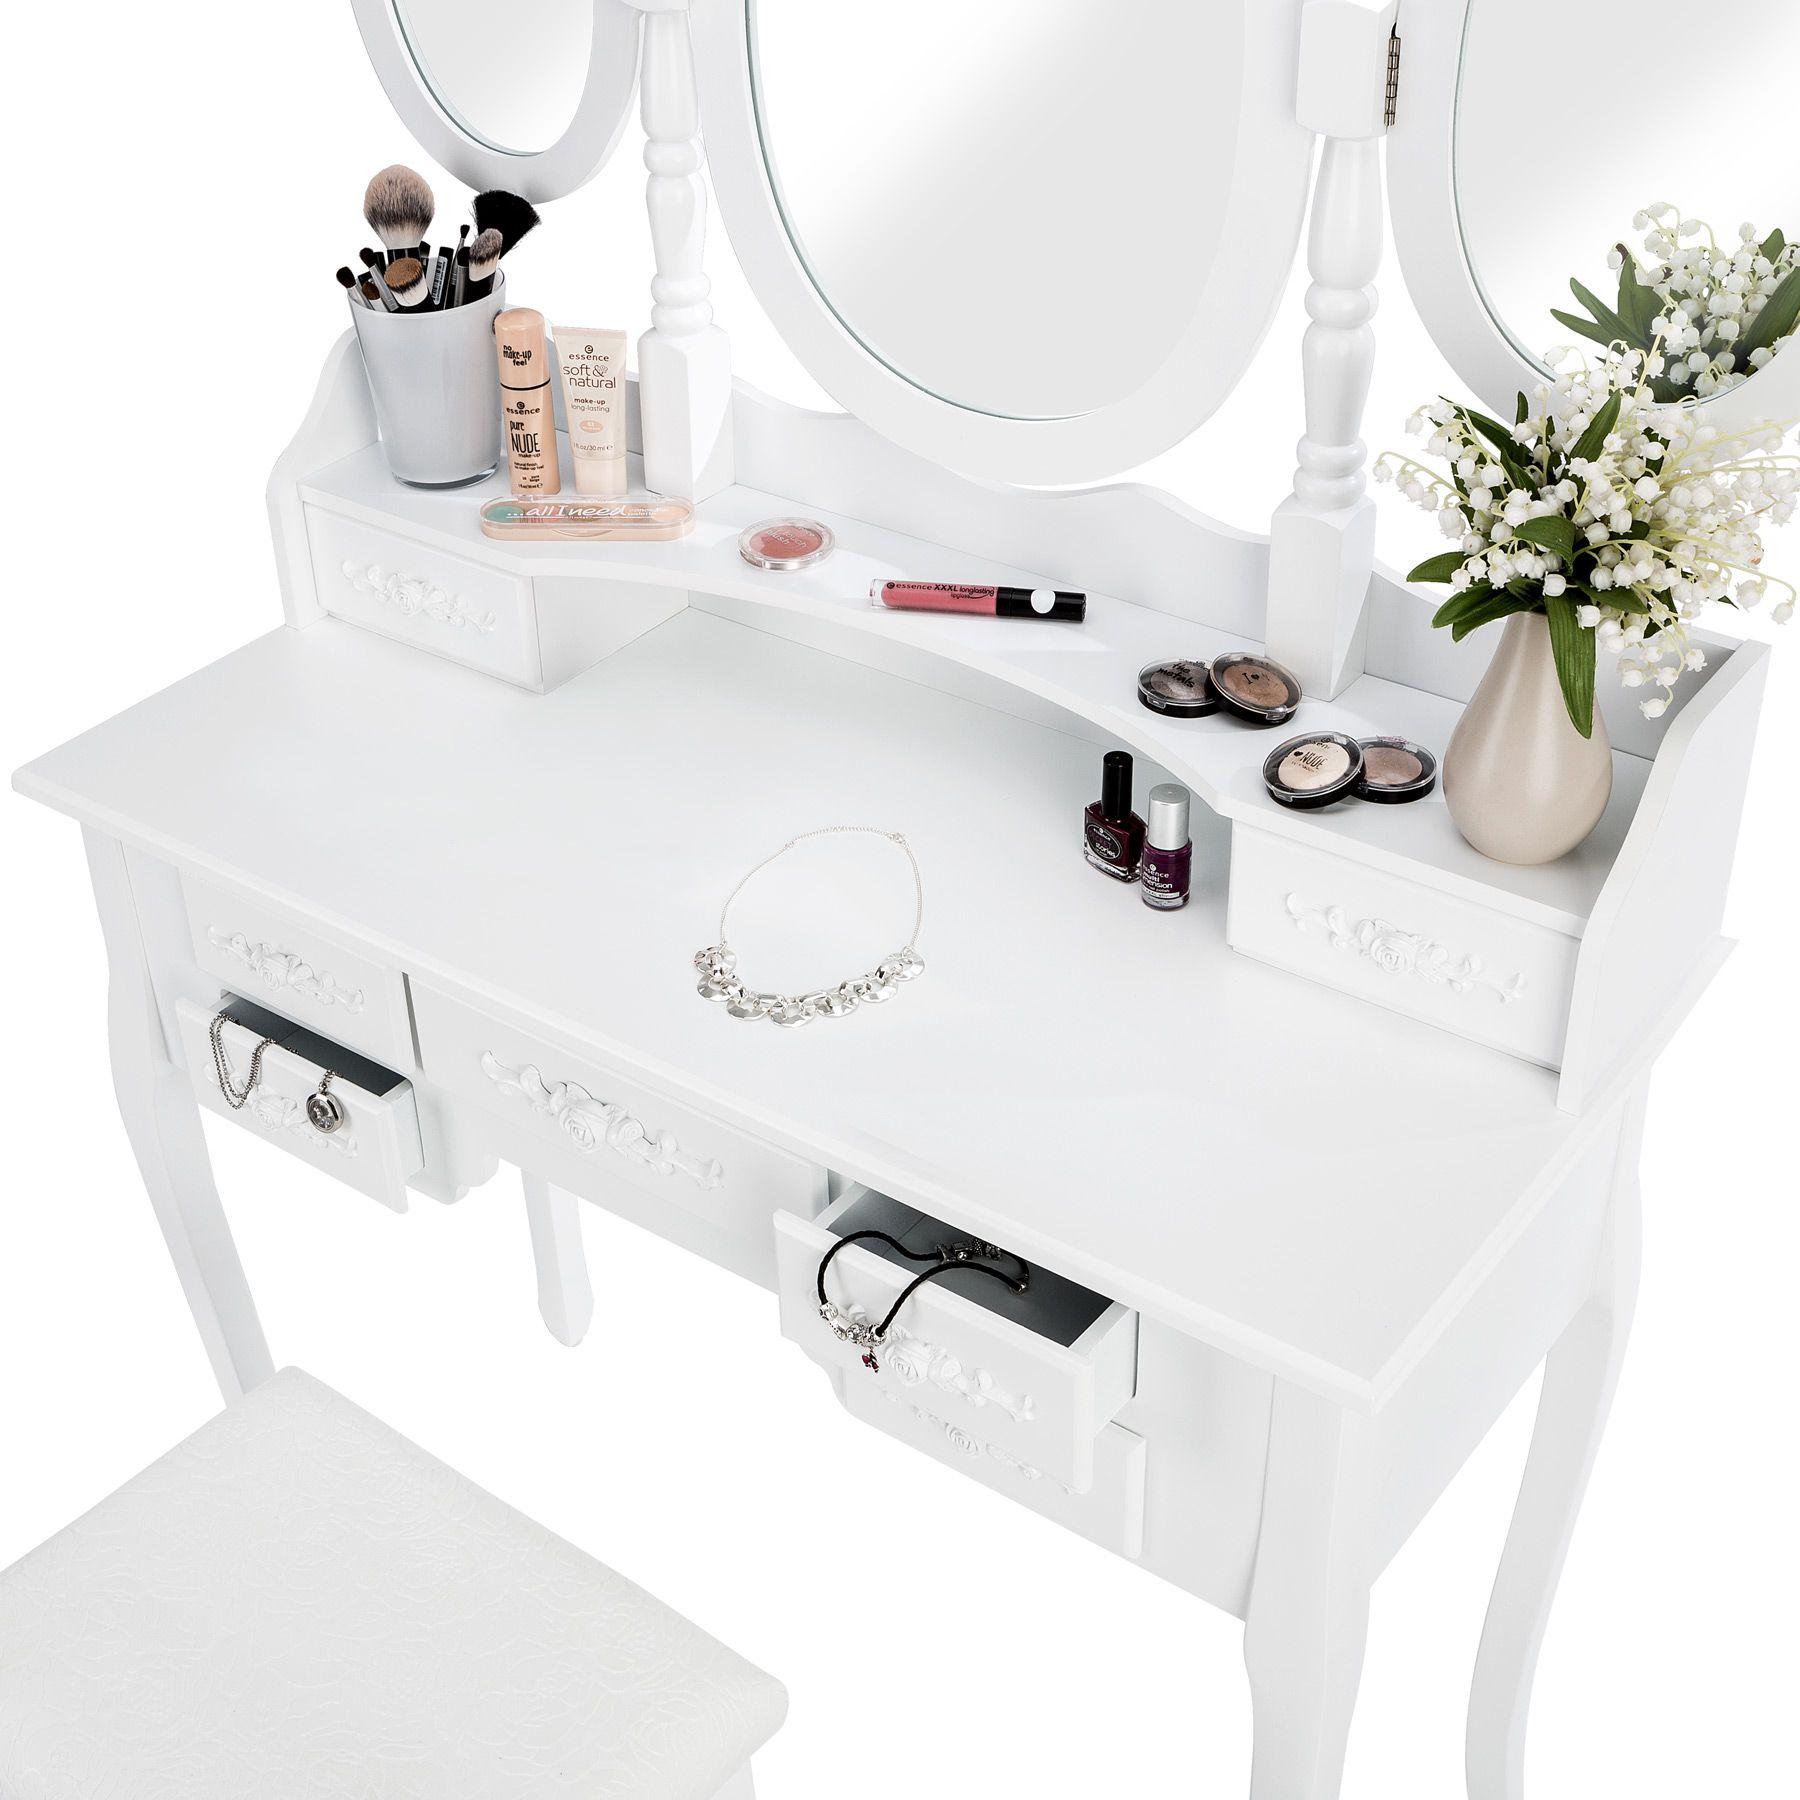 coiffeuse meuble table de maquillage tabouret commode avec 3 miroirs blanc ebay. Black Bedroom Furniture Sets. Home Design Ideas